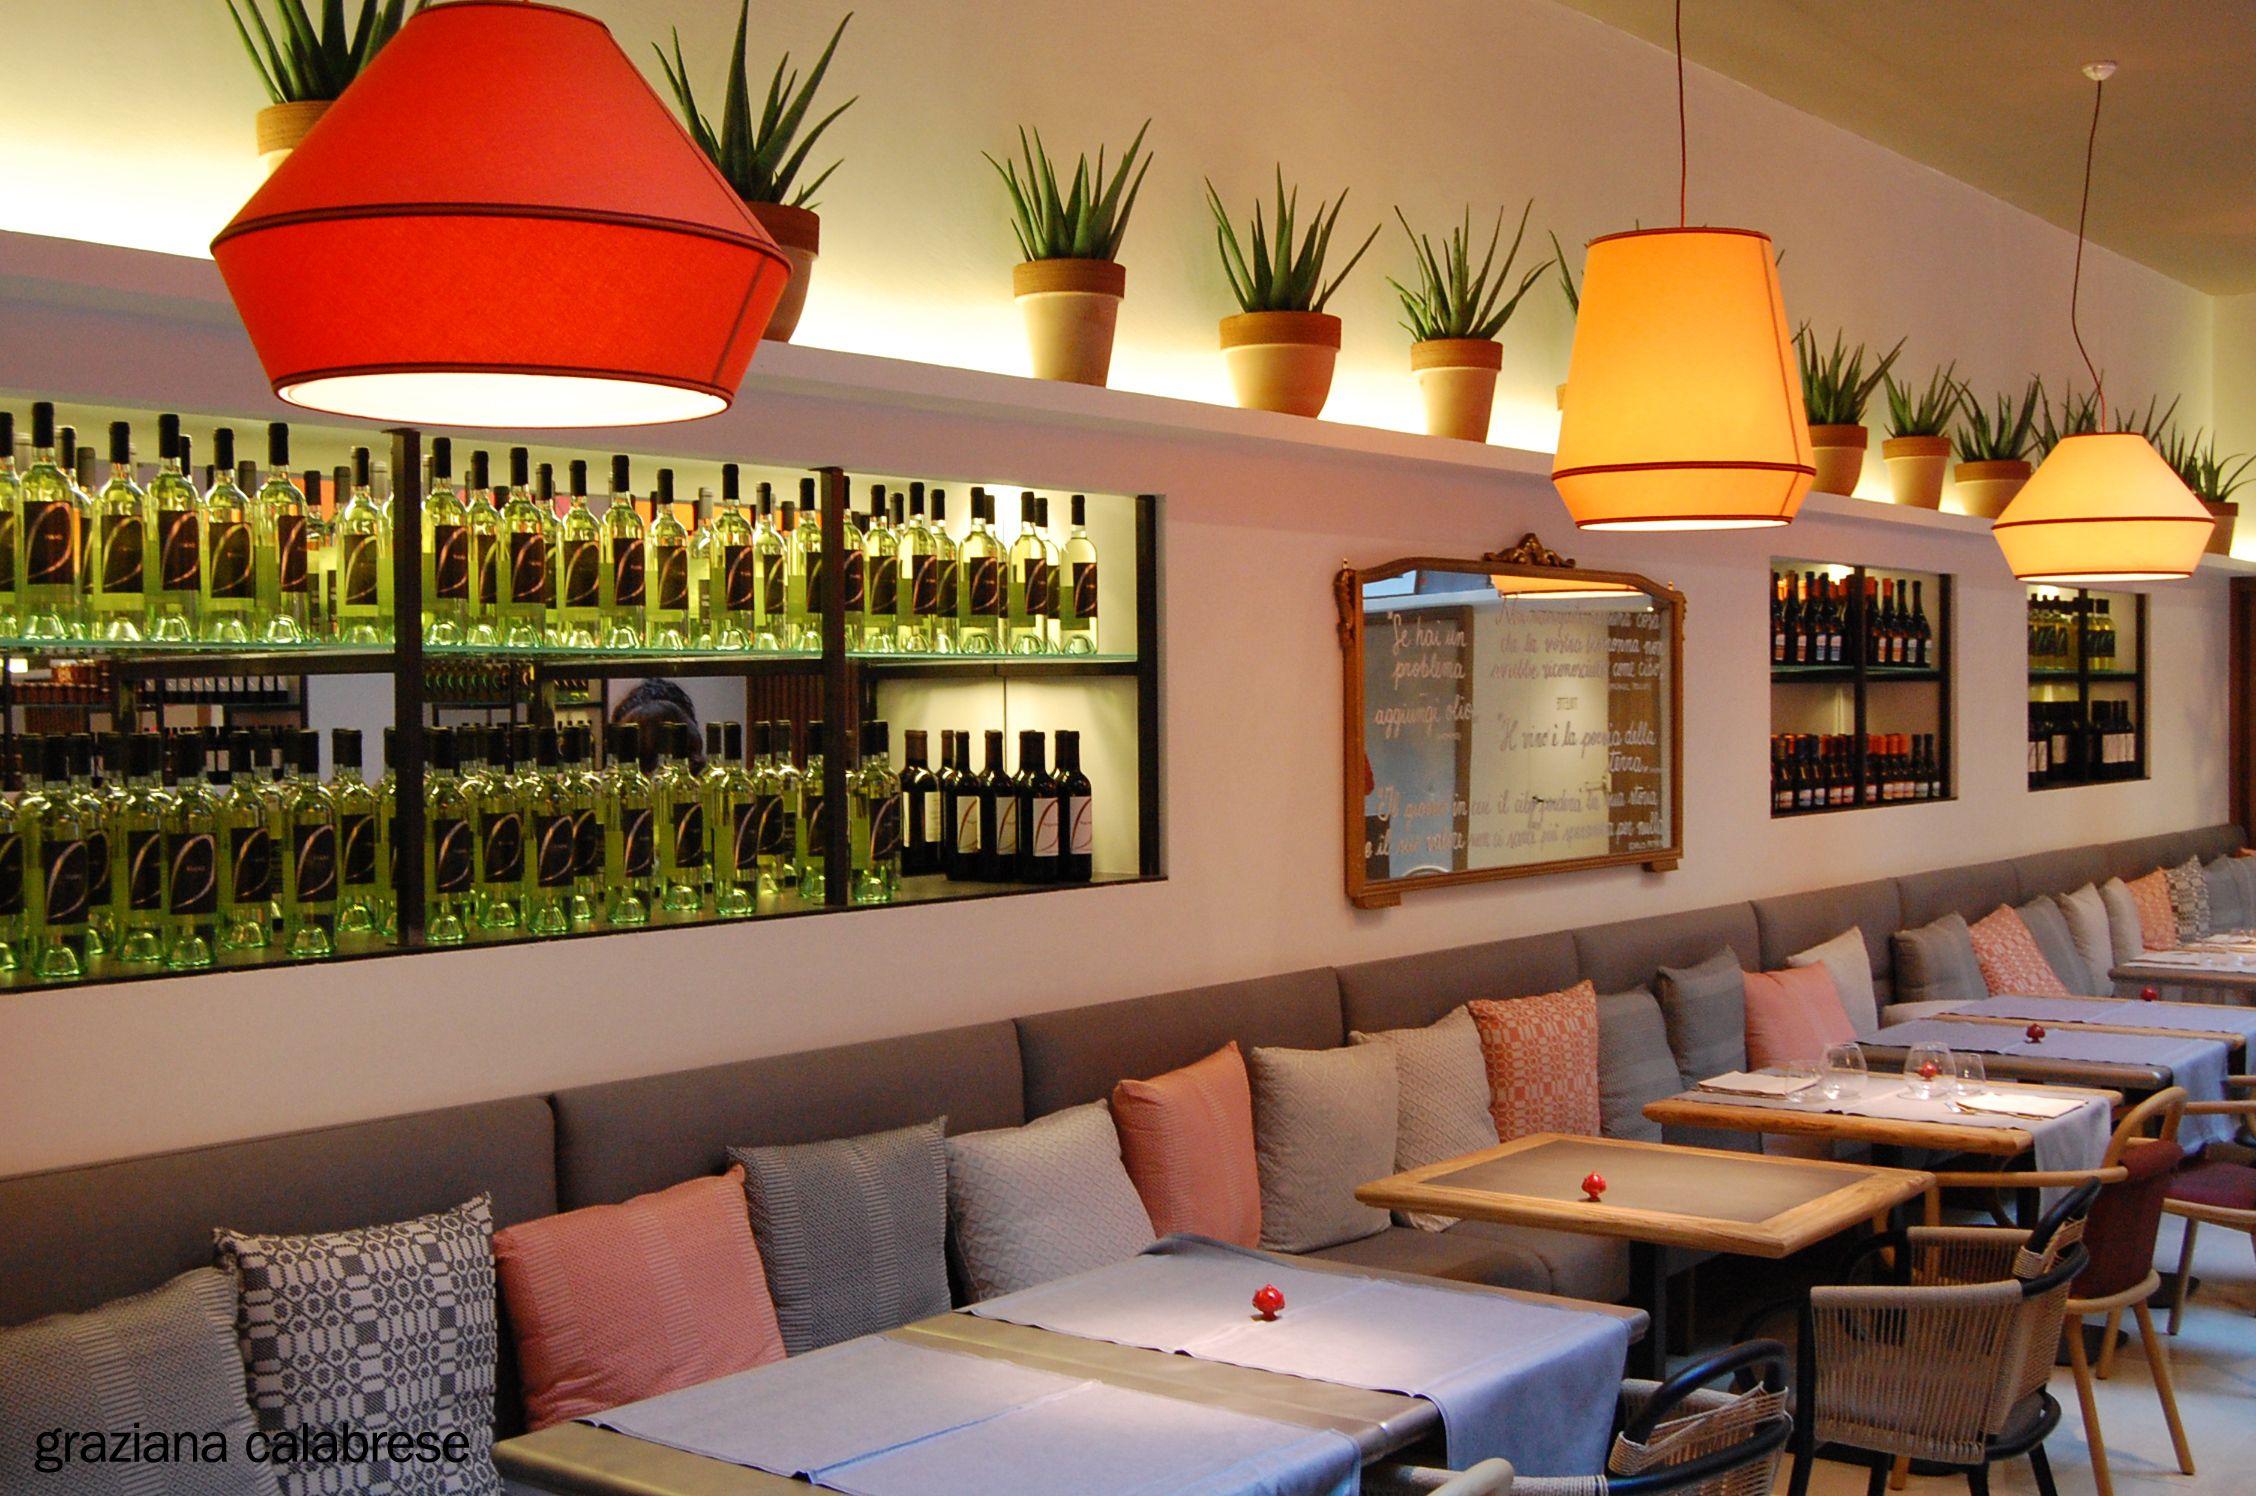 Pulia Italian Restaurant Bakery Shop And Coffee Bar Eclectic Interior Design